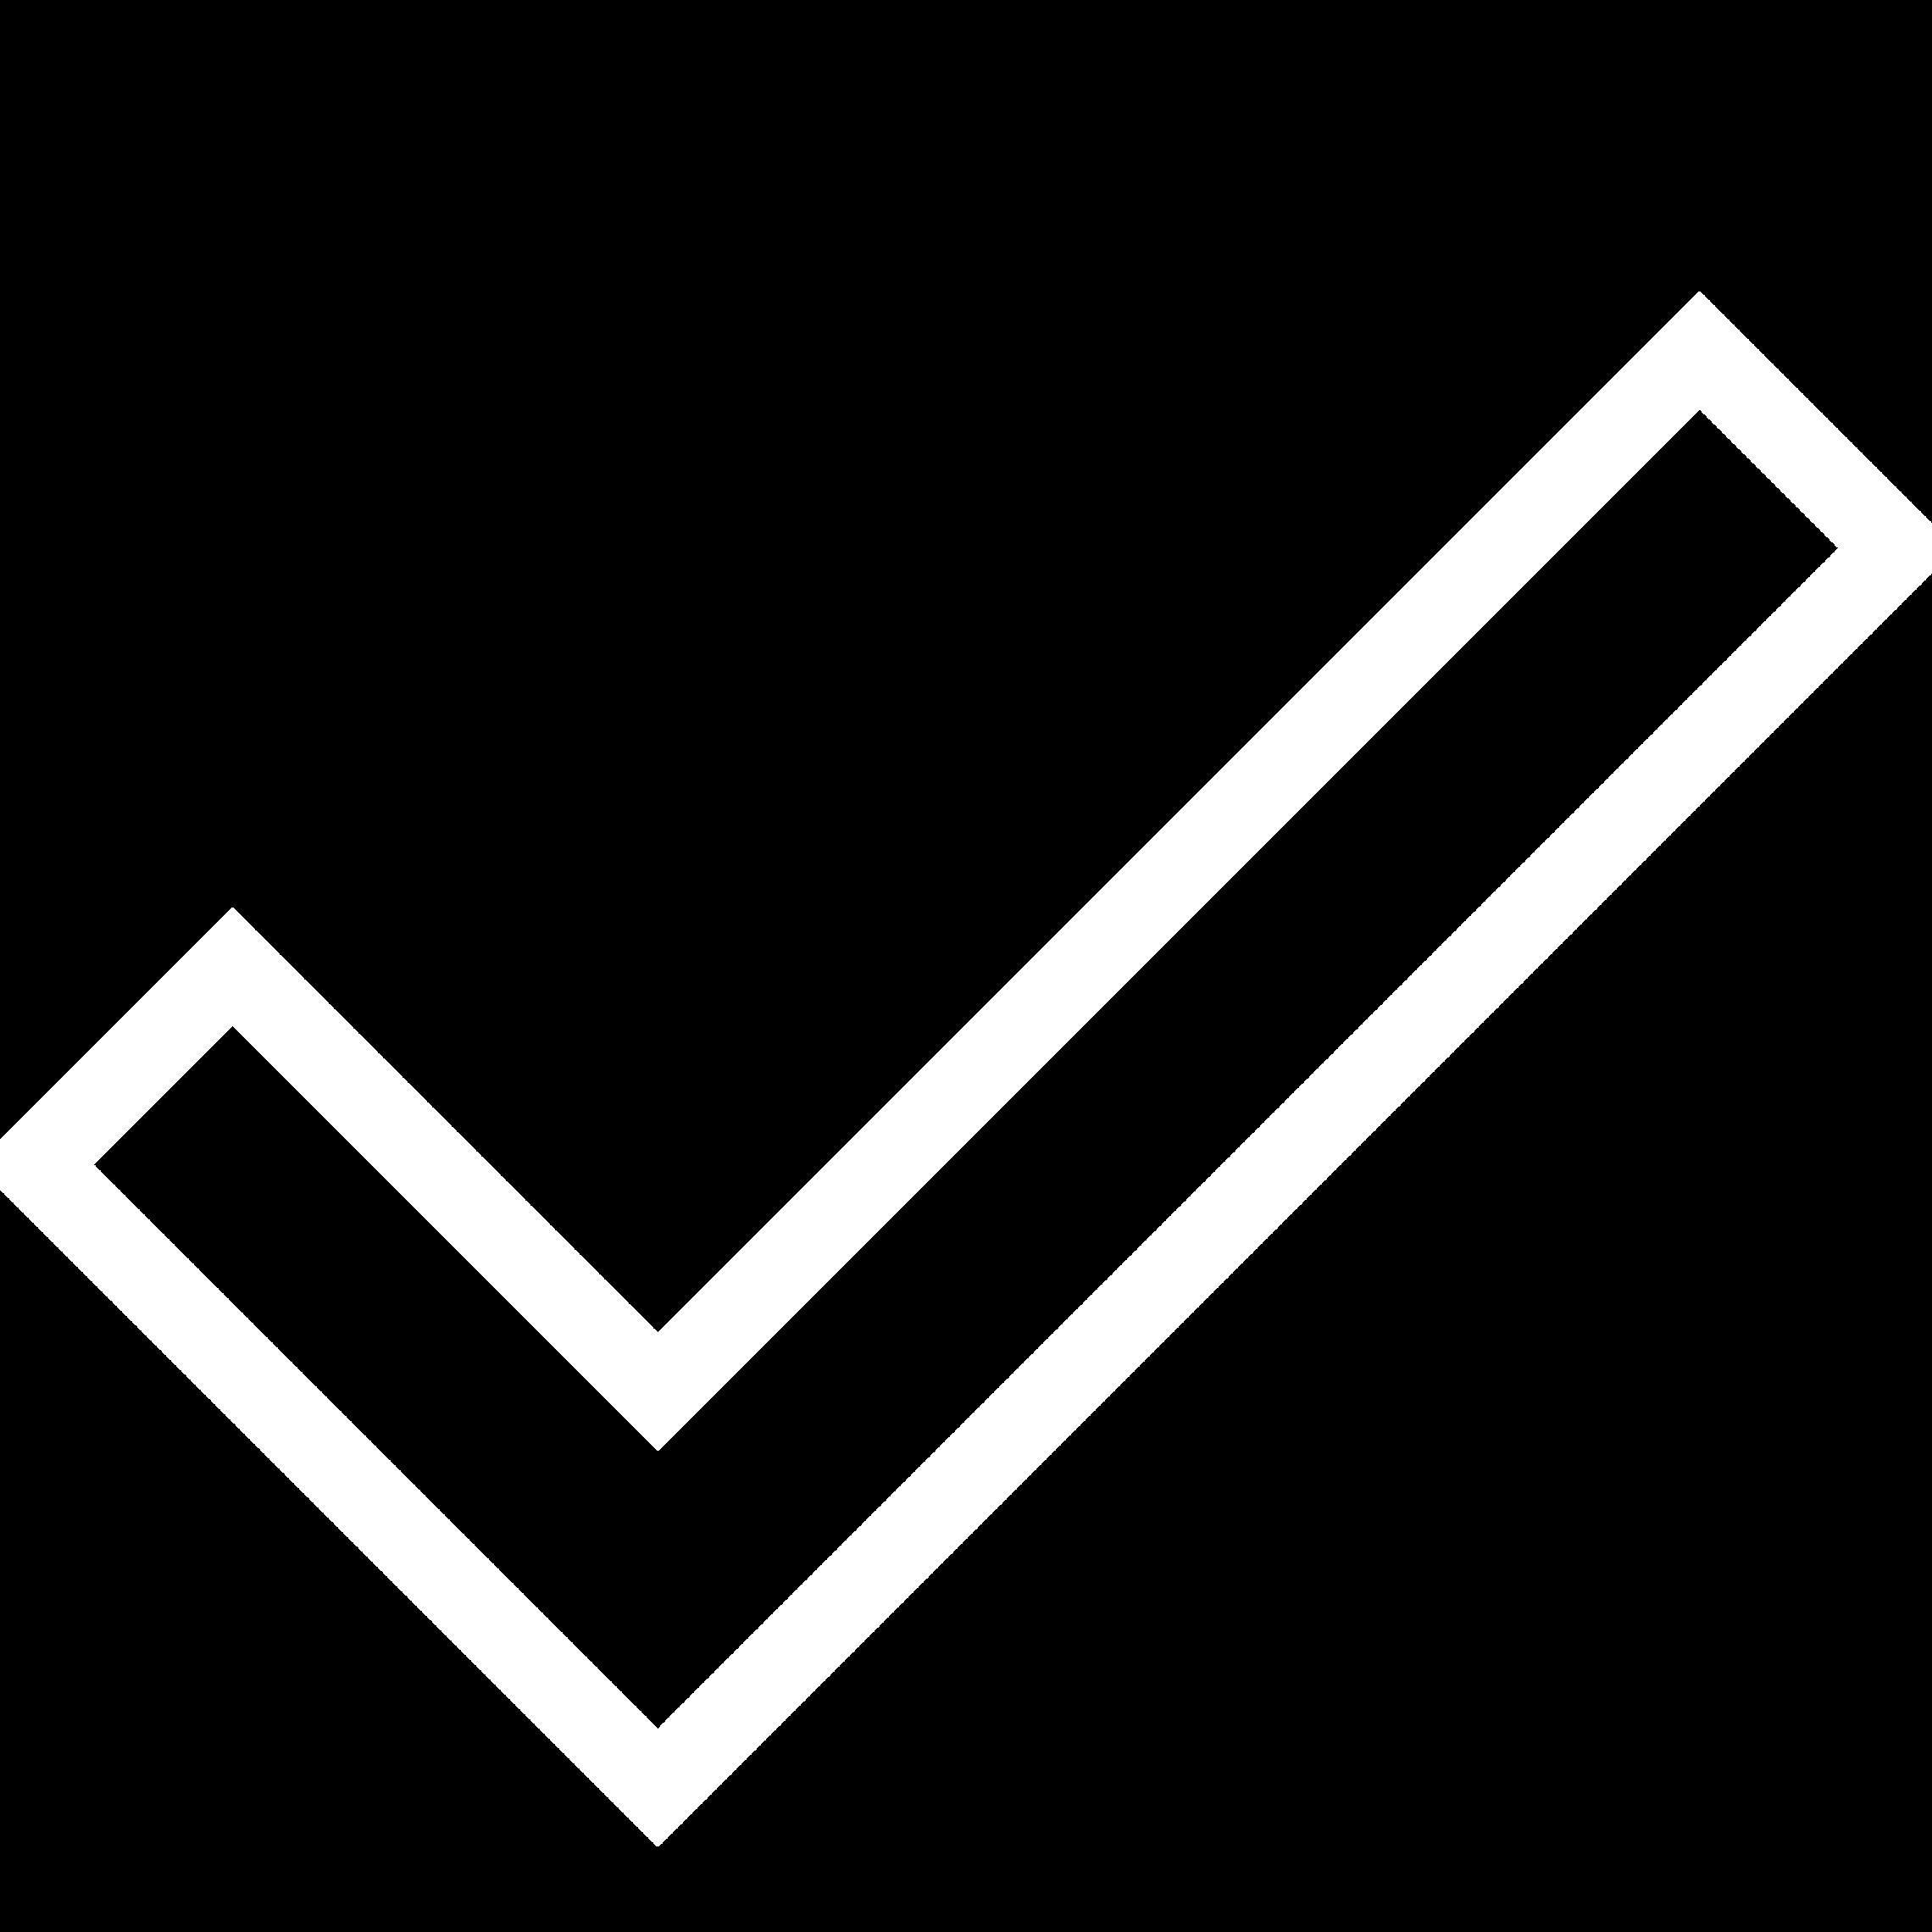 Checkmark Outline